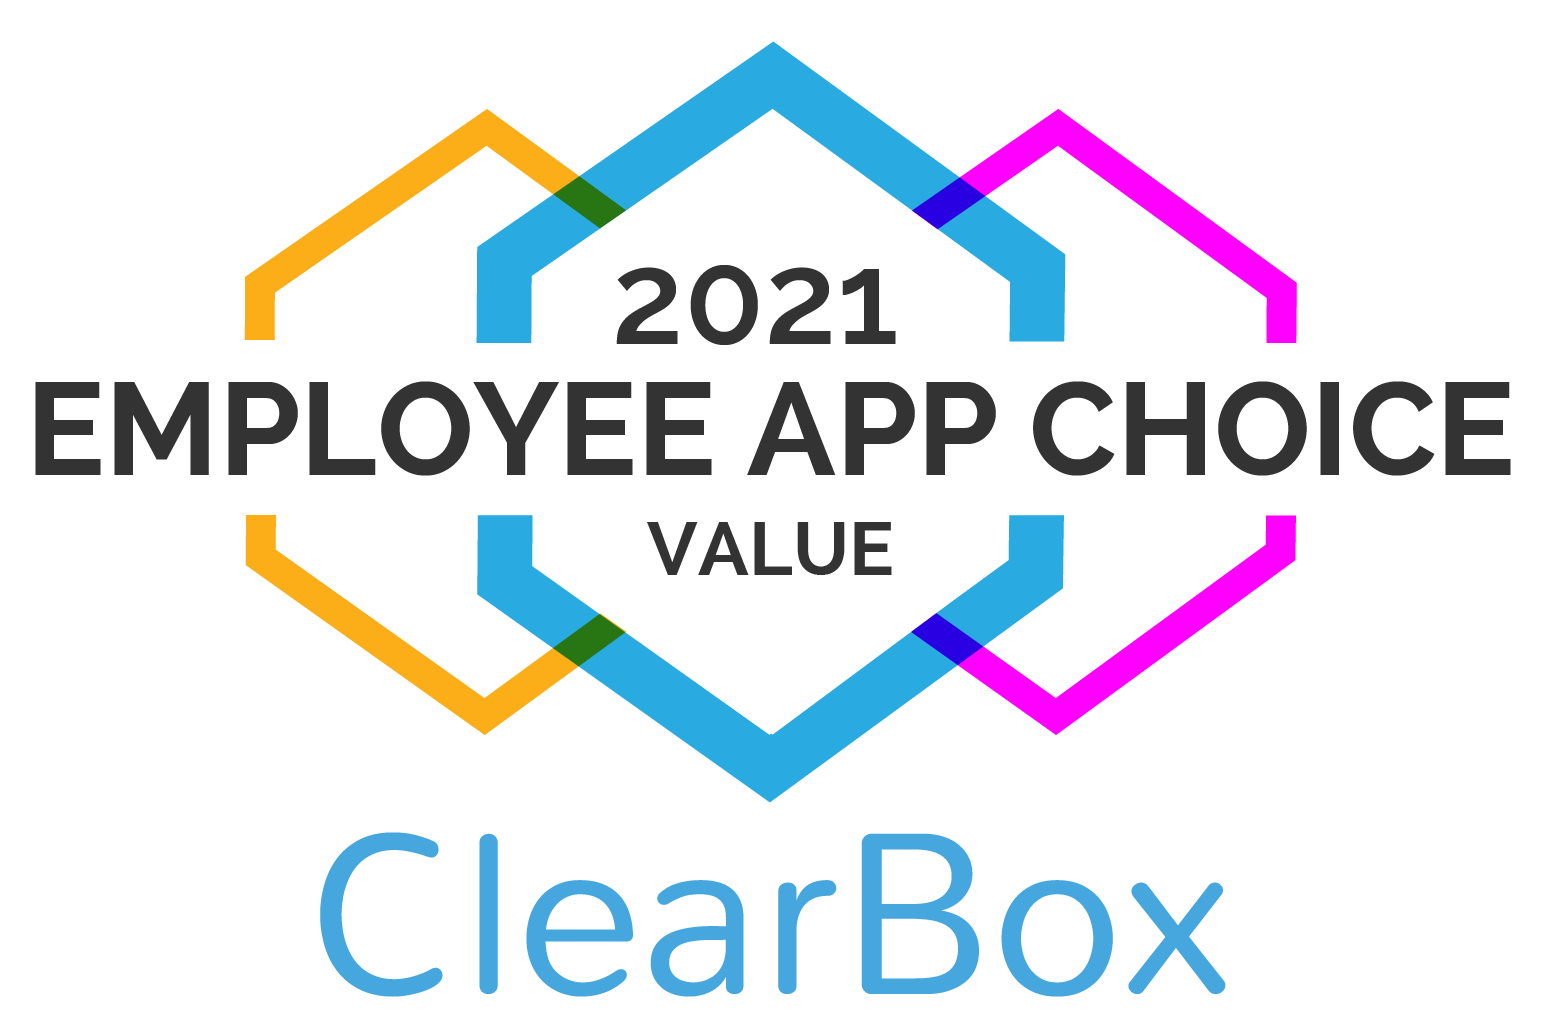 Employee app choice Value 2021.